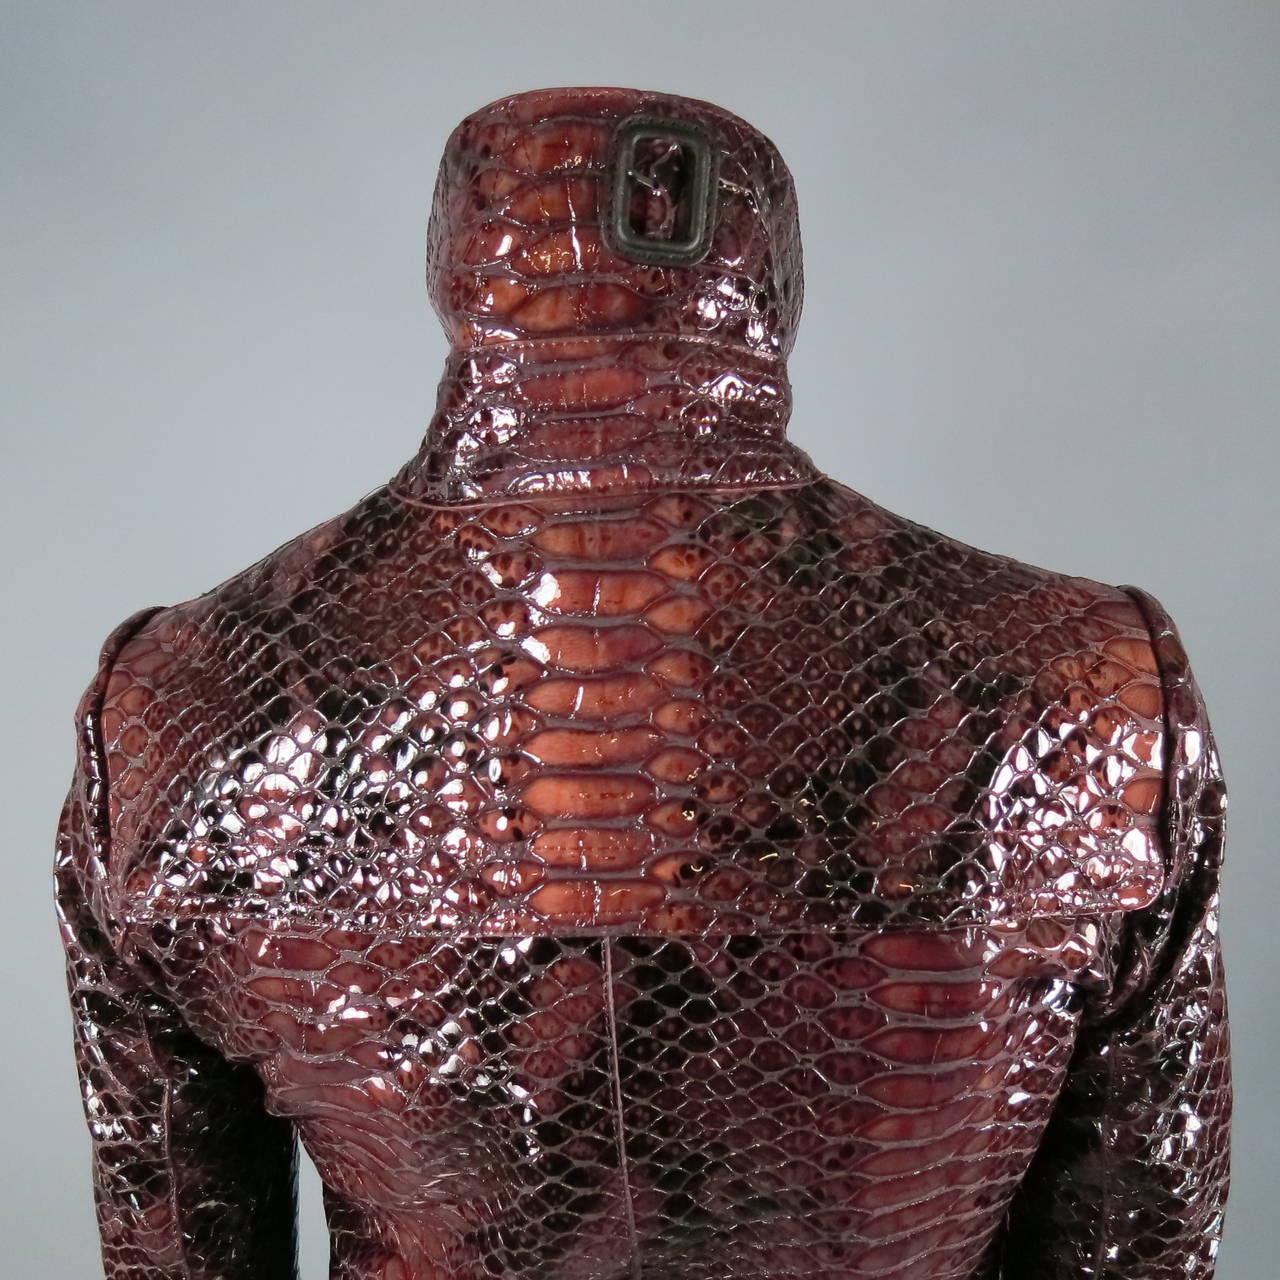 2013's BURBERRY PRORSUM Size 4 Burgundy Python Embossed Patent Leather Jacket 6